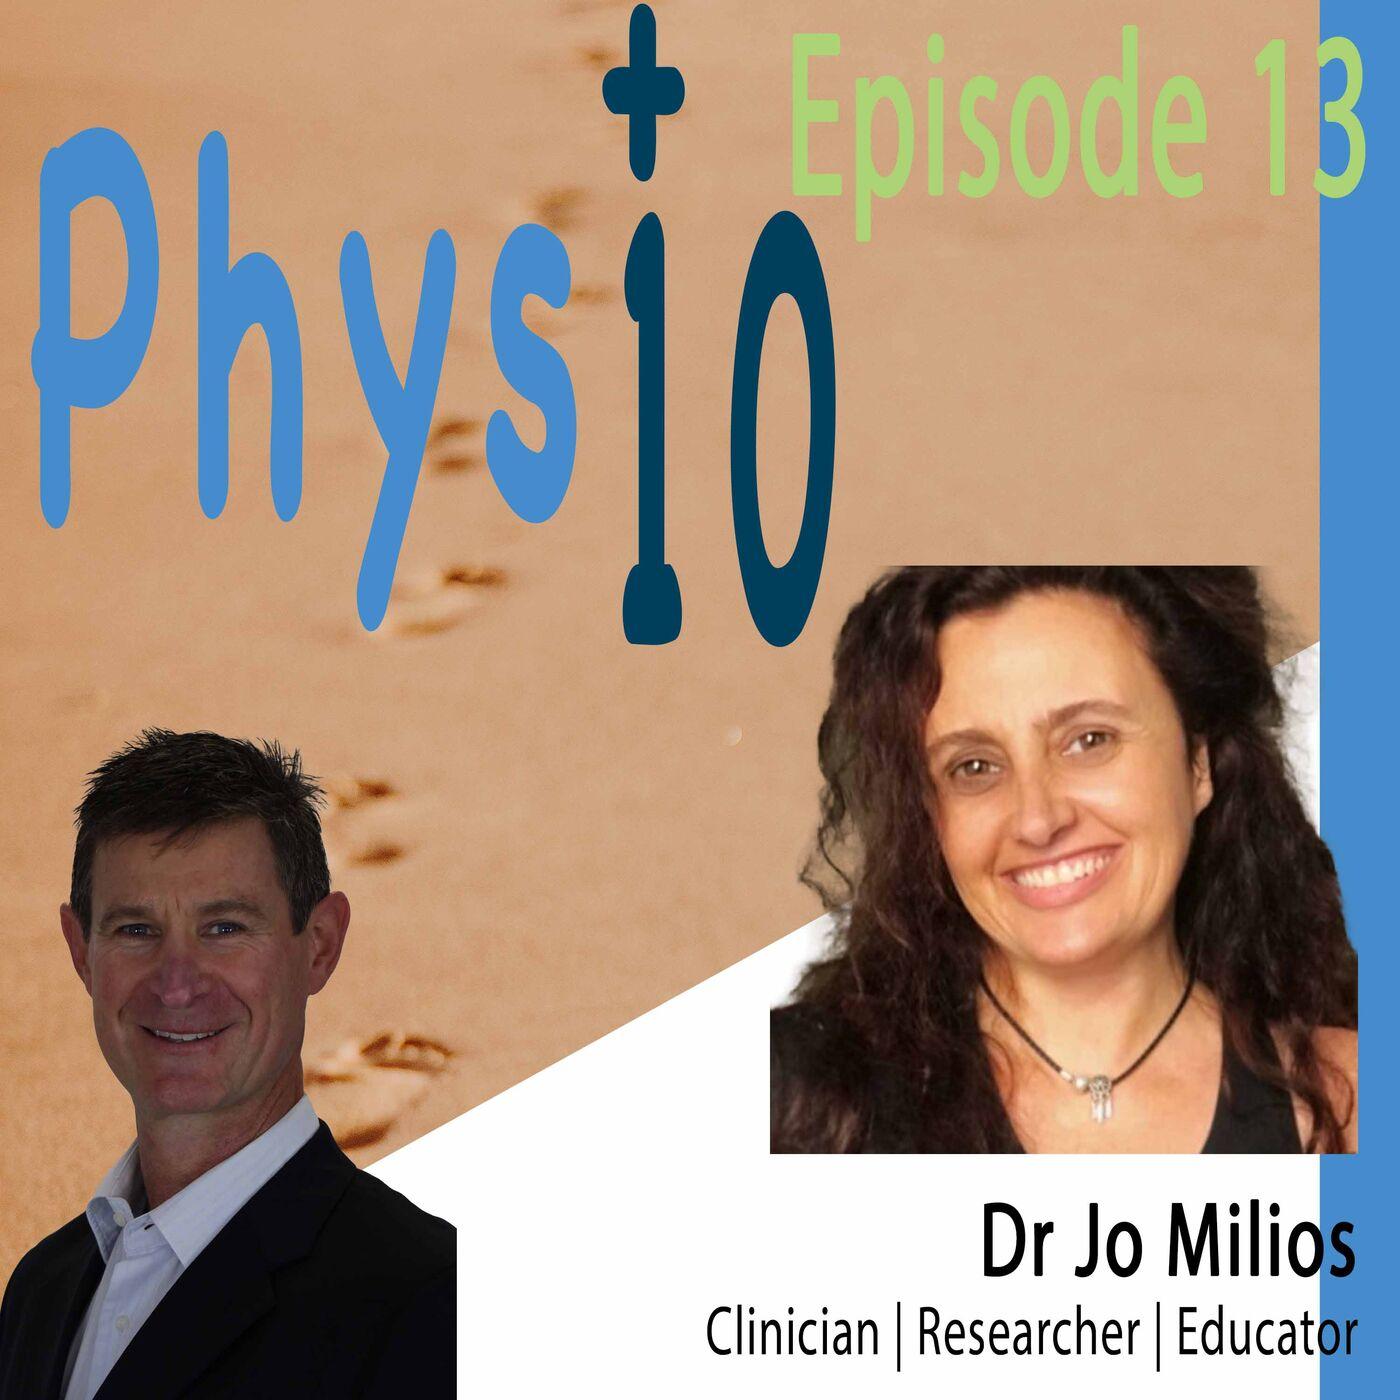 Dr Jo Milios Researcher | Clinician | Educator